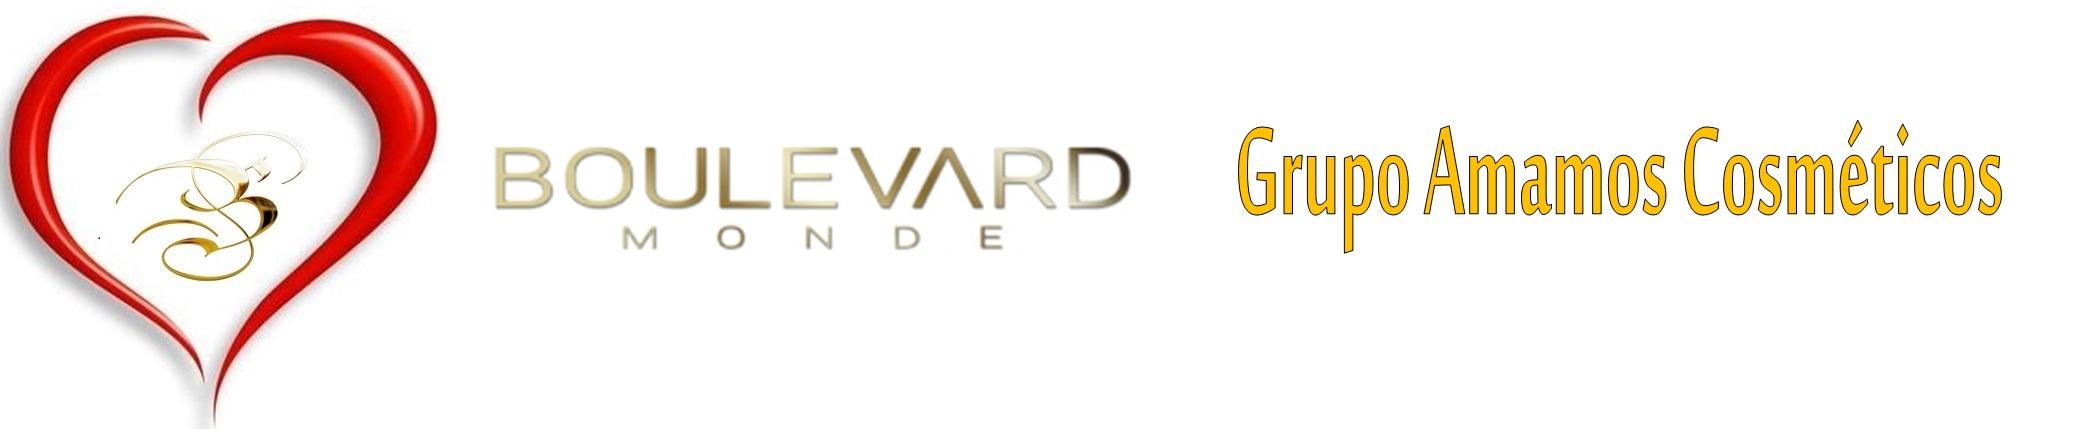 Boulevard Monde